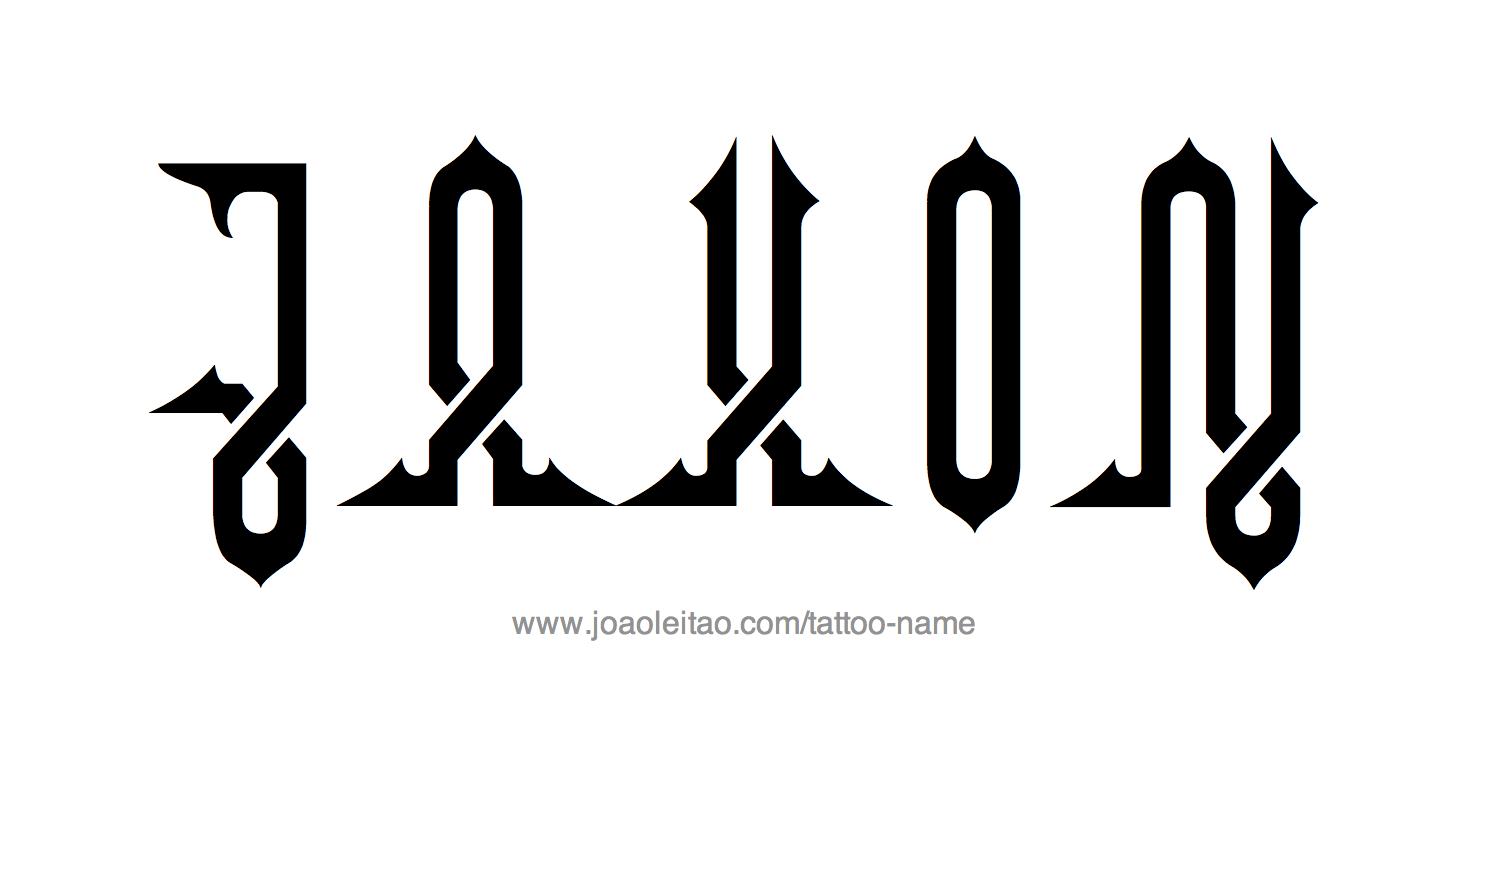 jaxon name tattoo designs. Black Bedroom Furniture Sets. Home Design Ideas